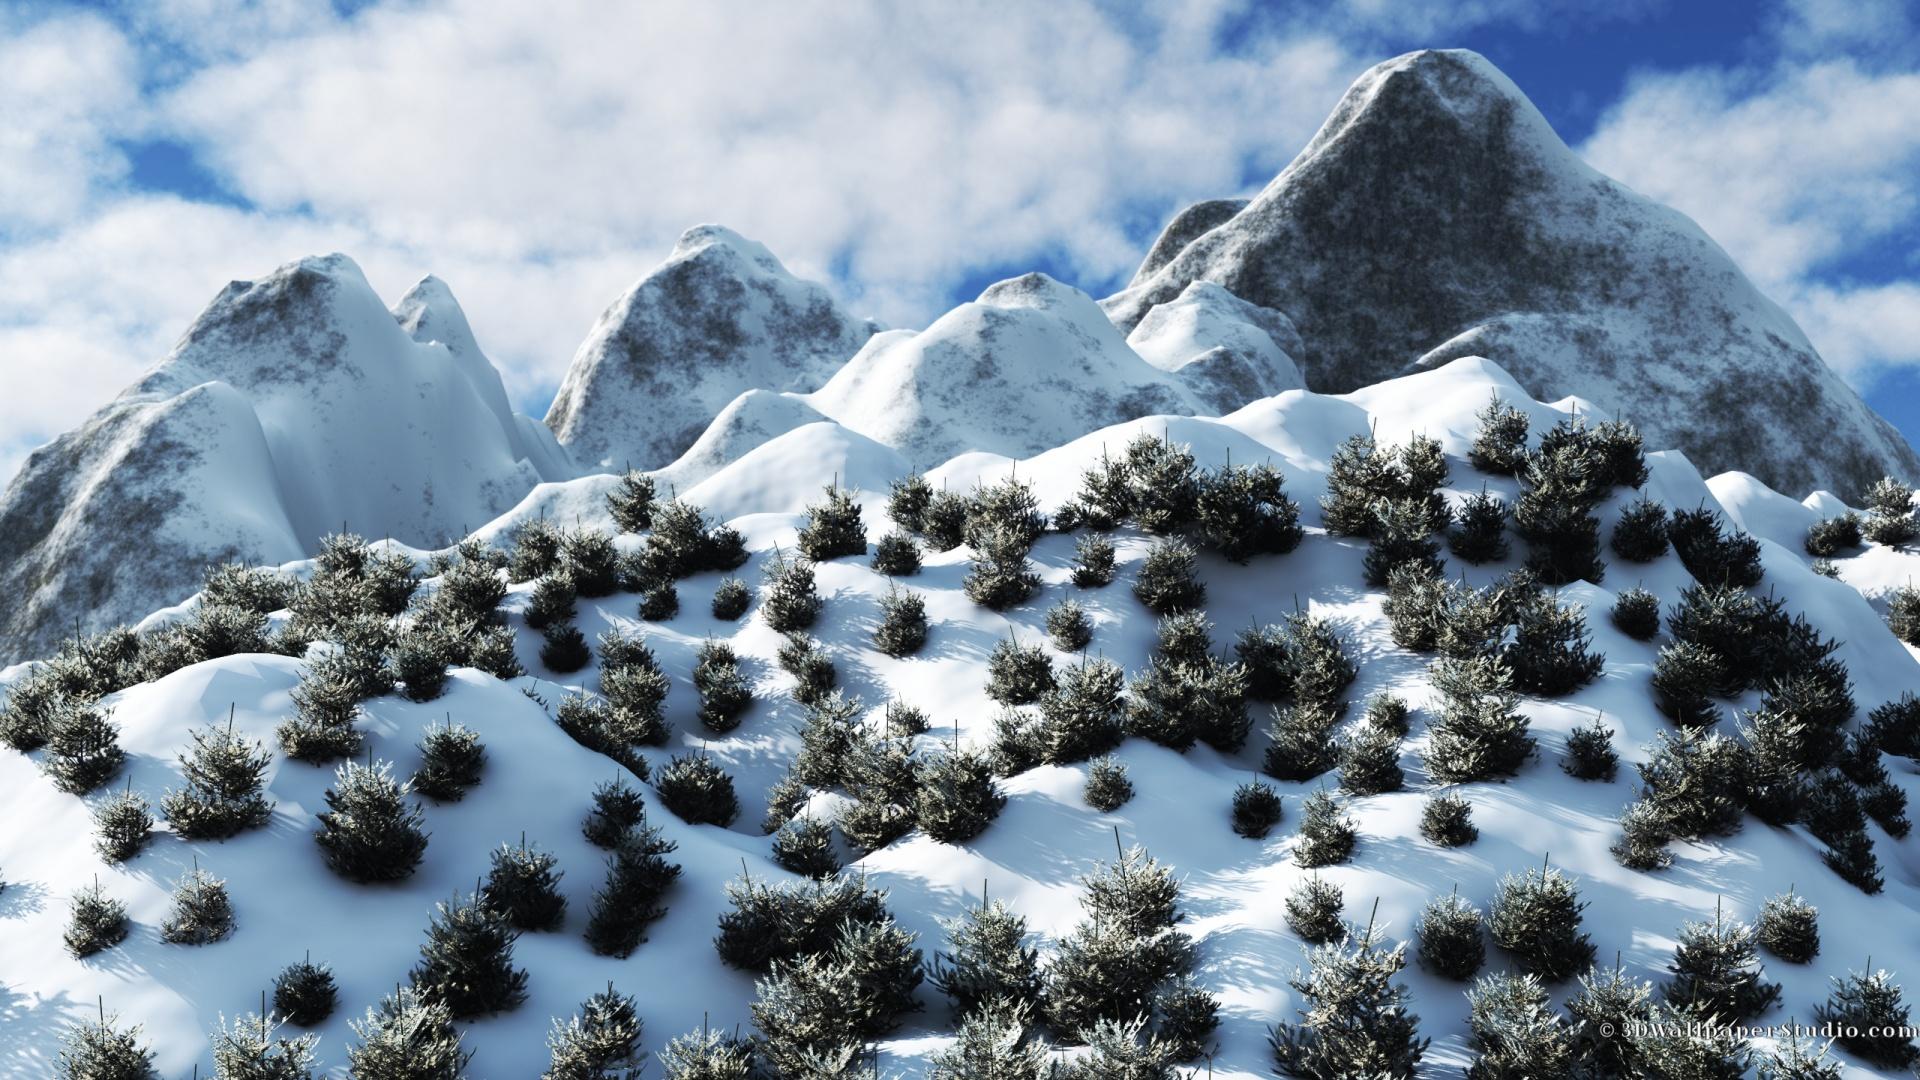 winter mountains wallpaper wallpapers 1920x1080 1920x1080